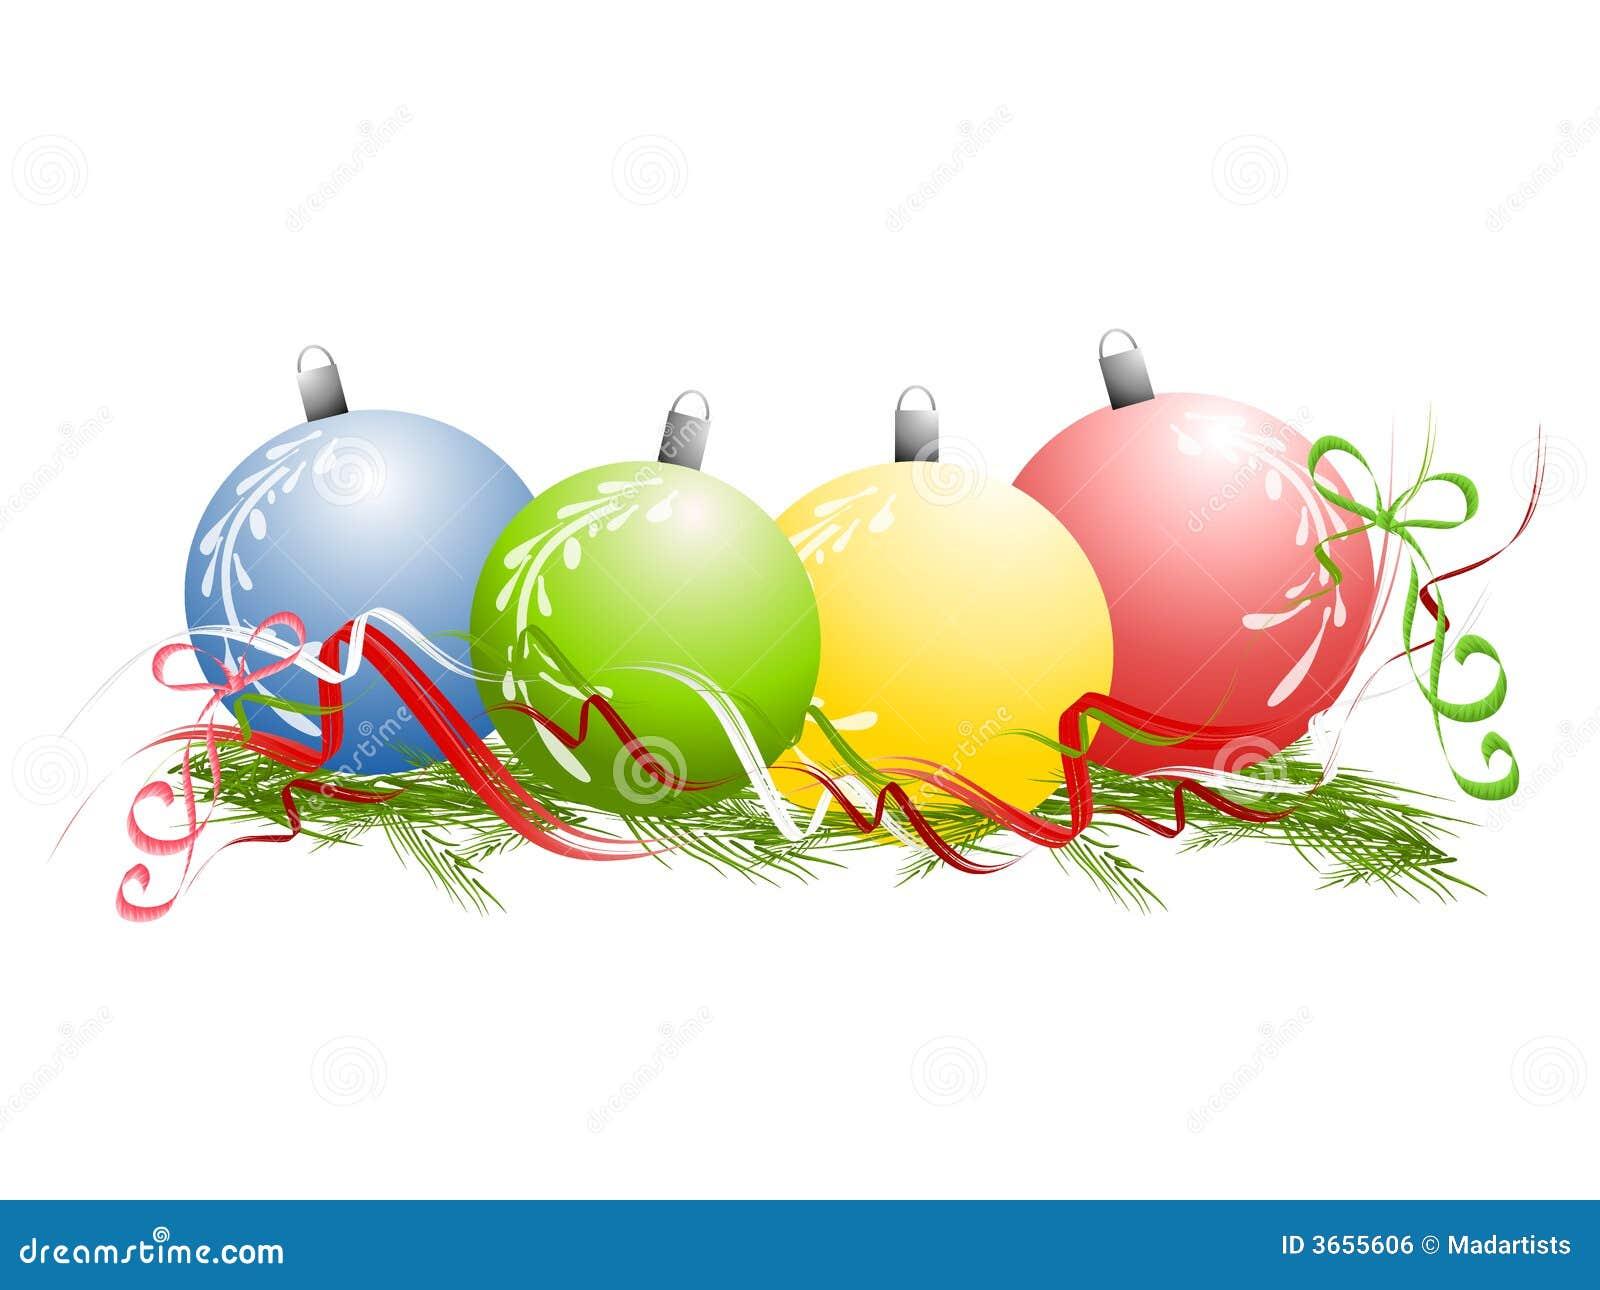 Christmas Decorations Pile